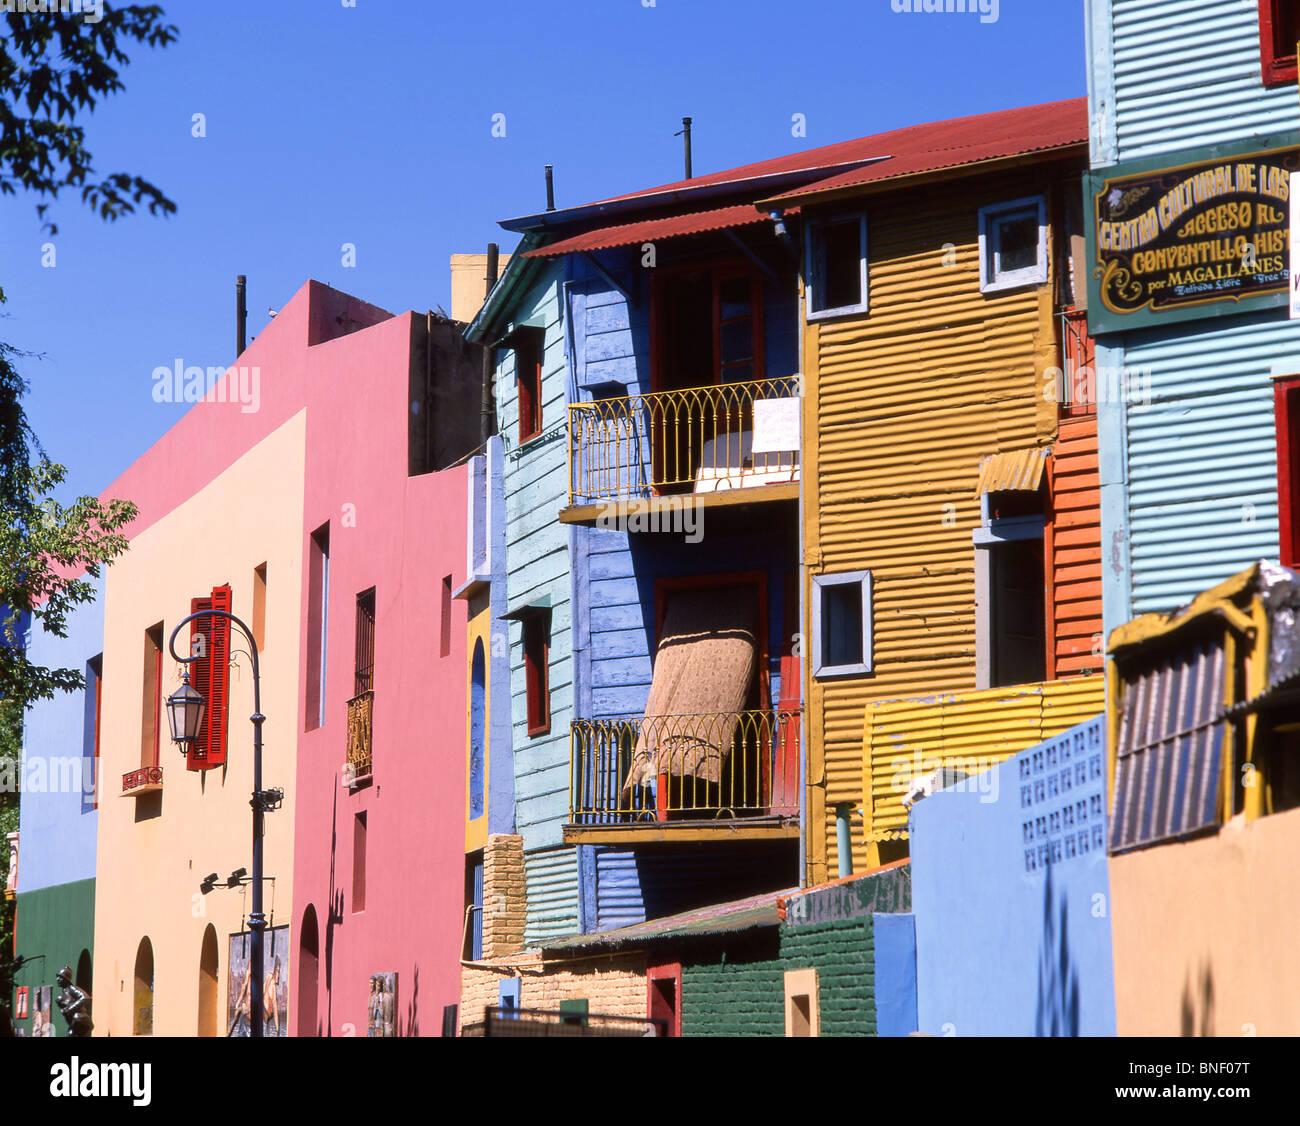 Pastel-coloured buildings, Caminito Street, La Boca, Buenos Aires, Argentina Stock Photo